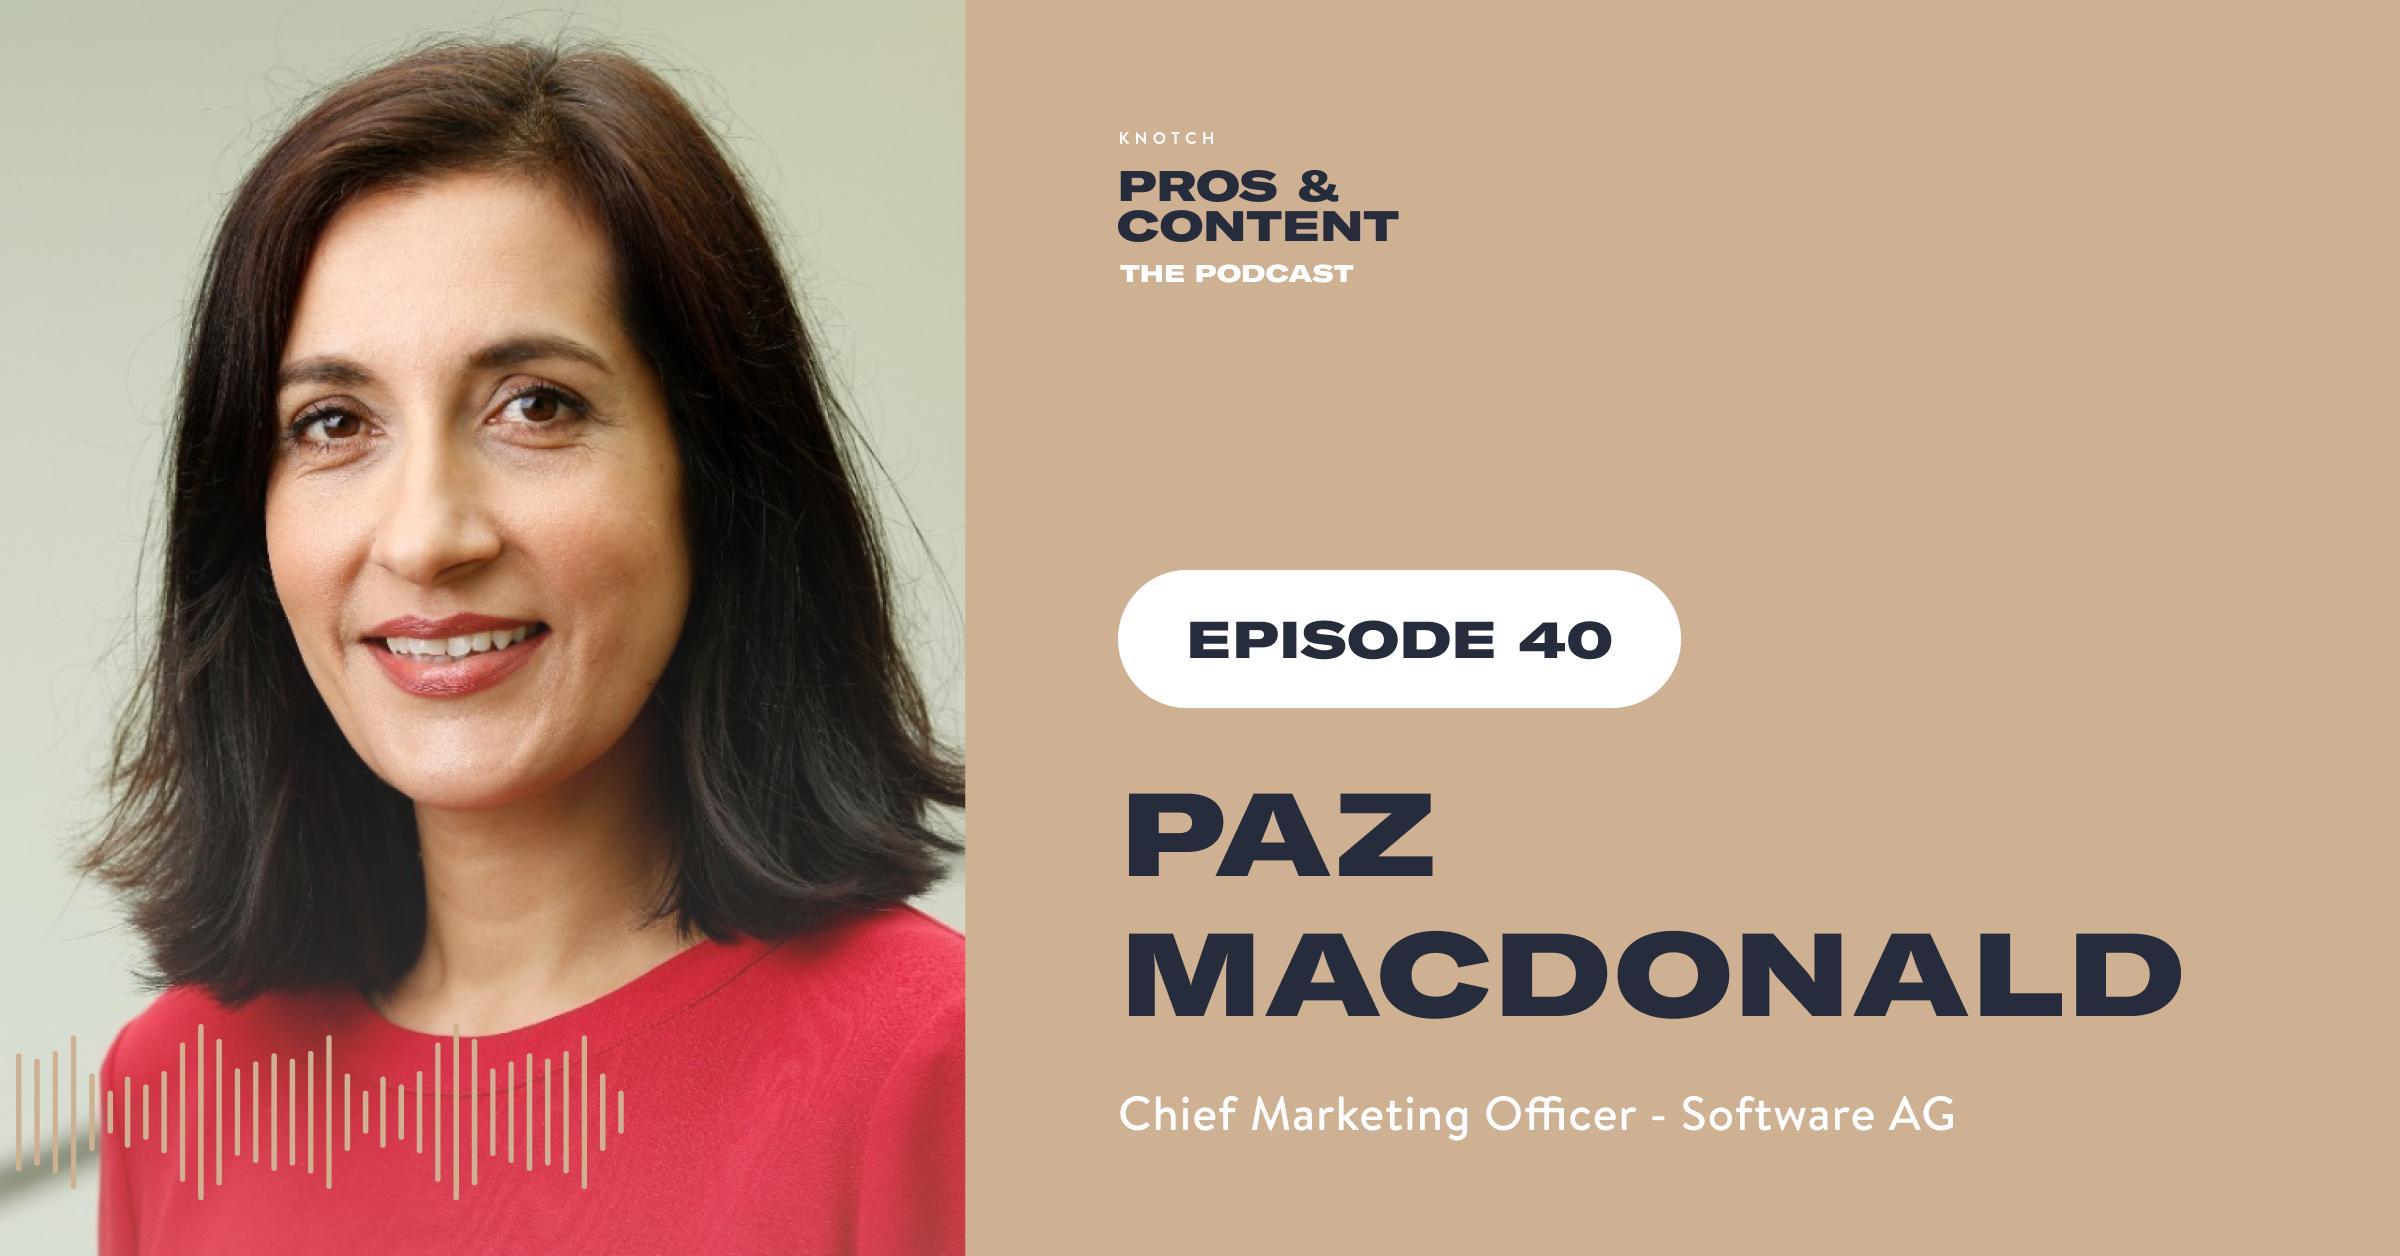 Pros & Content Podcast: Paz Macdonald